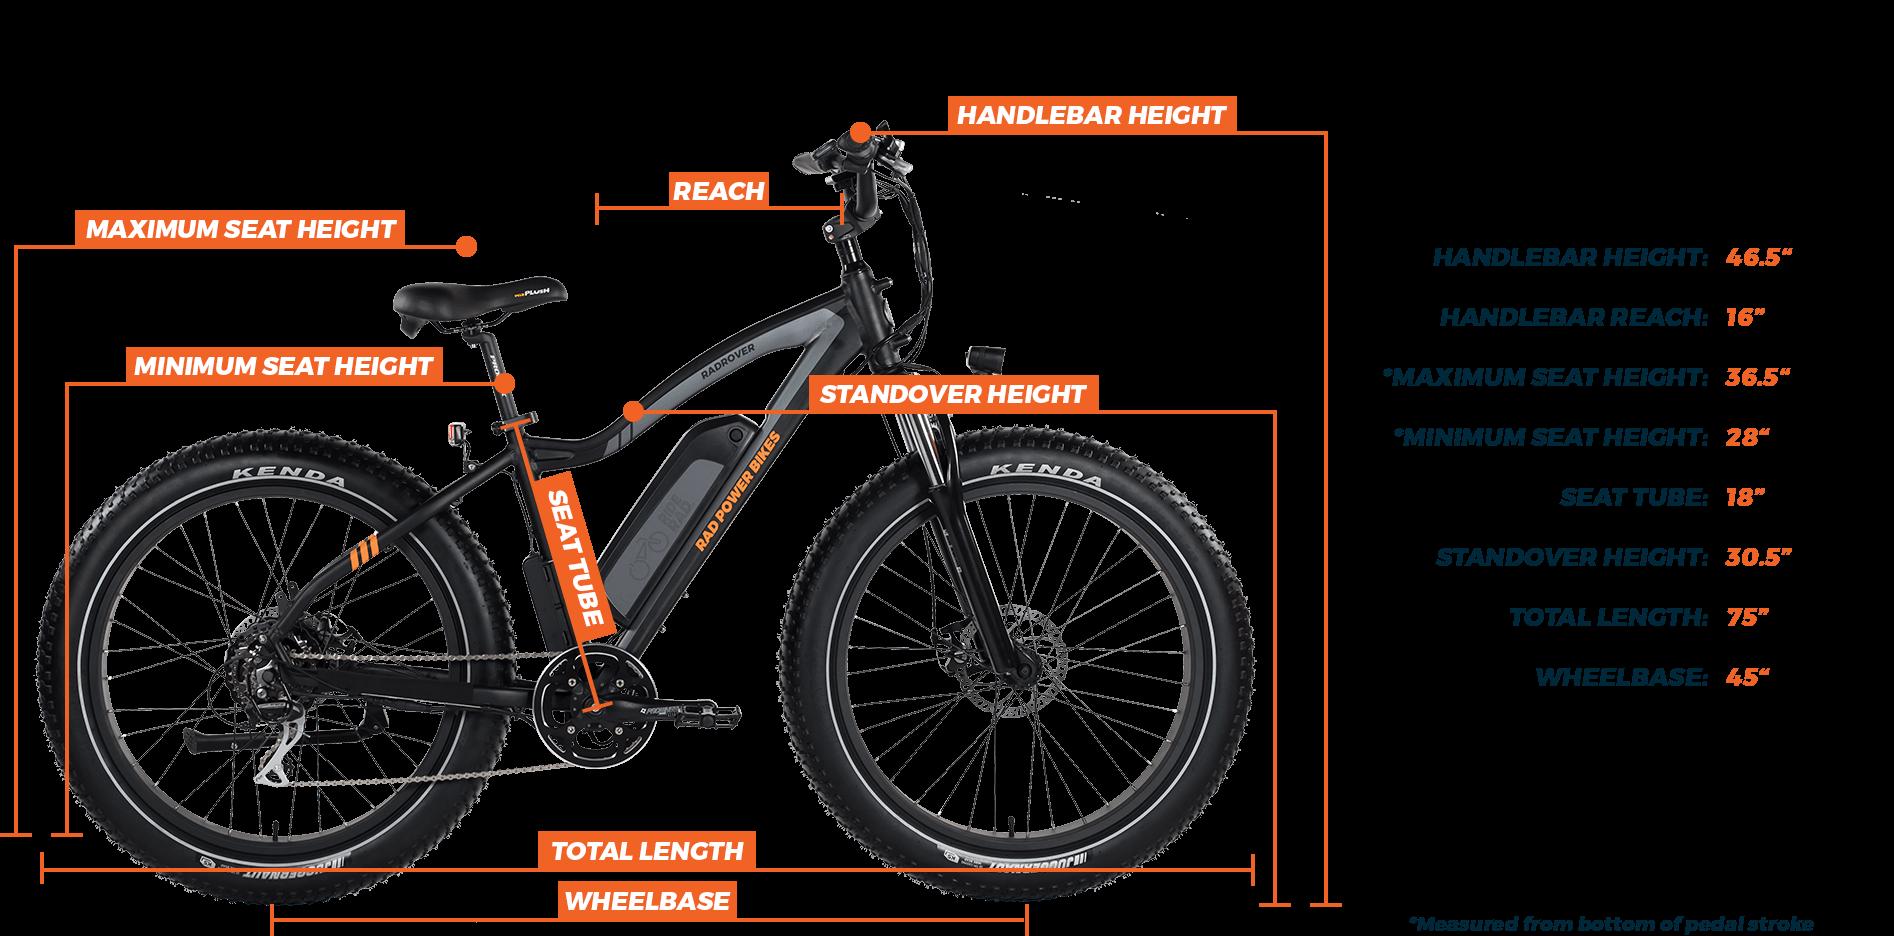 2019 Radrover Electric Fat Bike